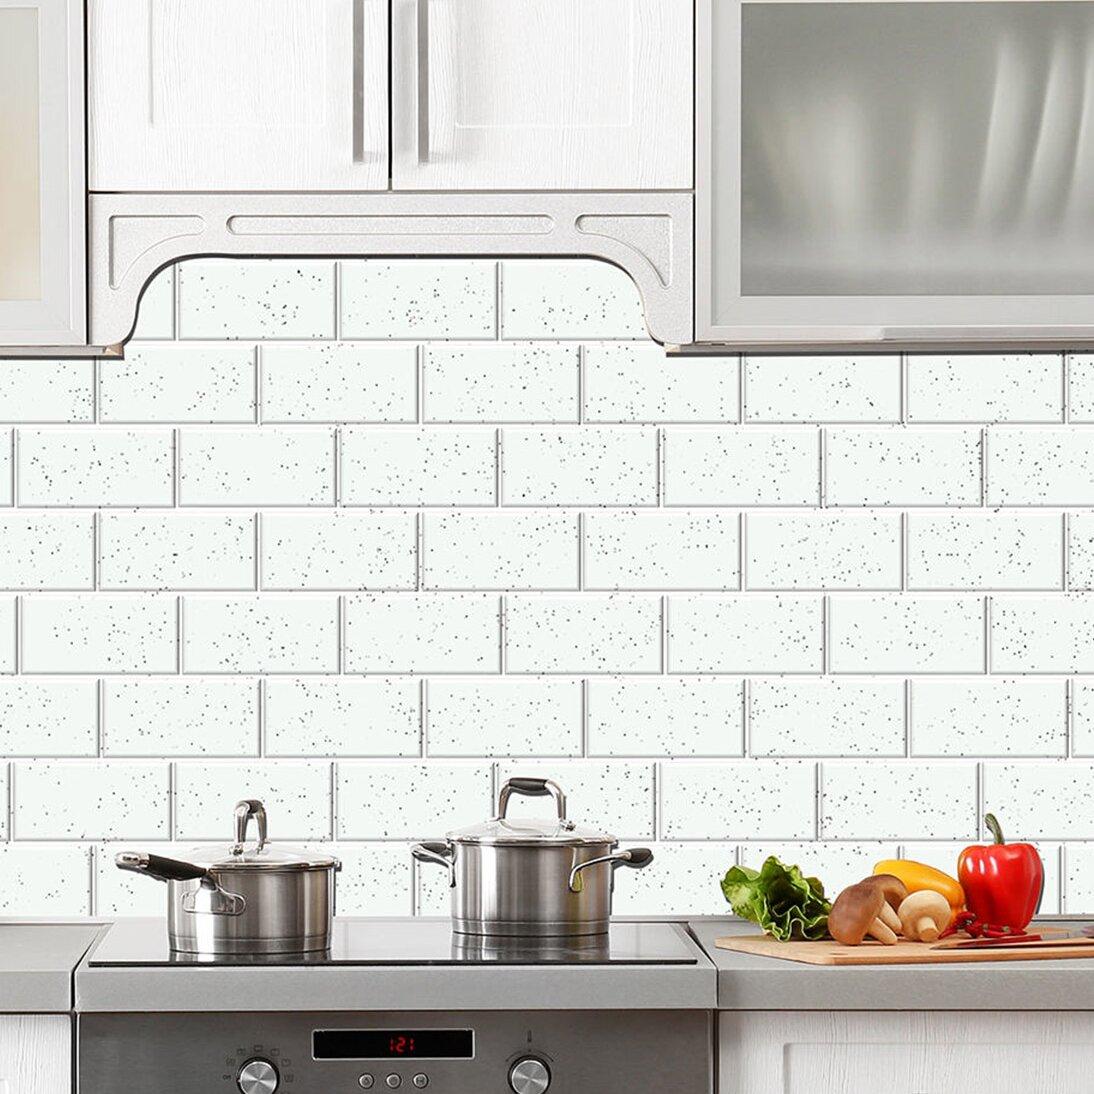 skinnytile 6 x 3 glass peel and stick subway tile in white. Black Bedroom Furniture Sets. Home Design Ideas